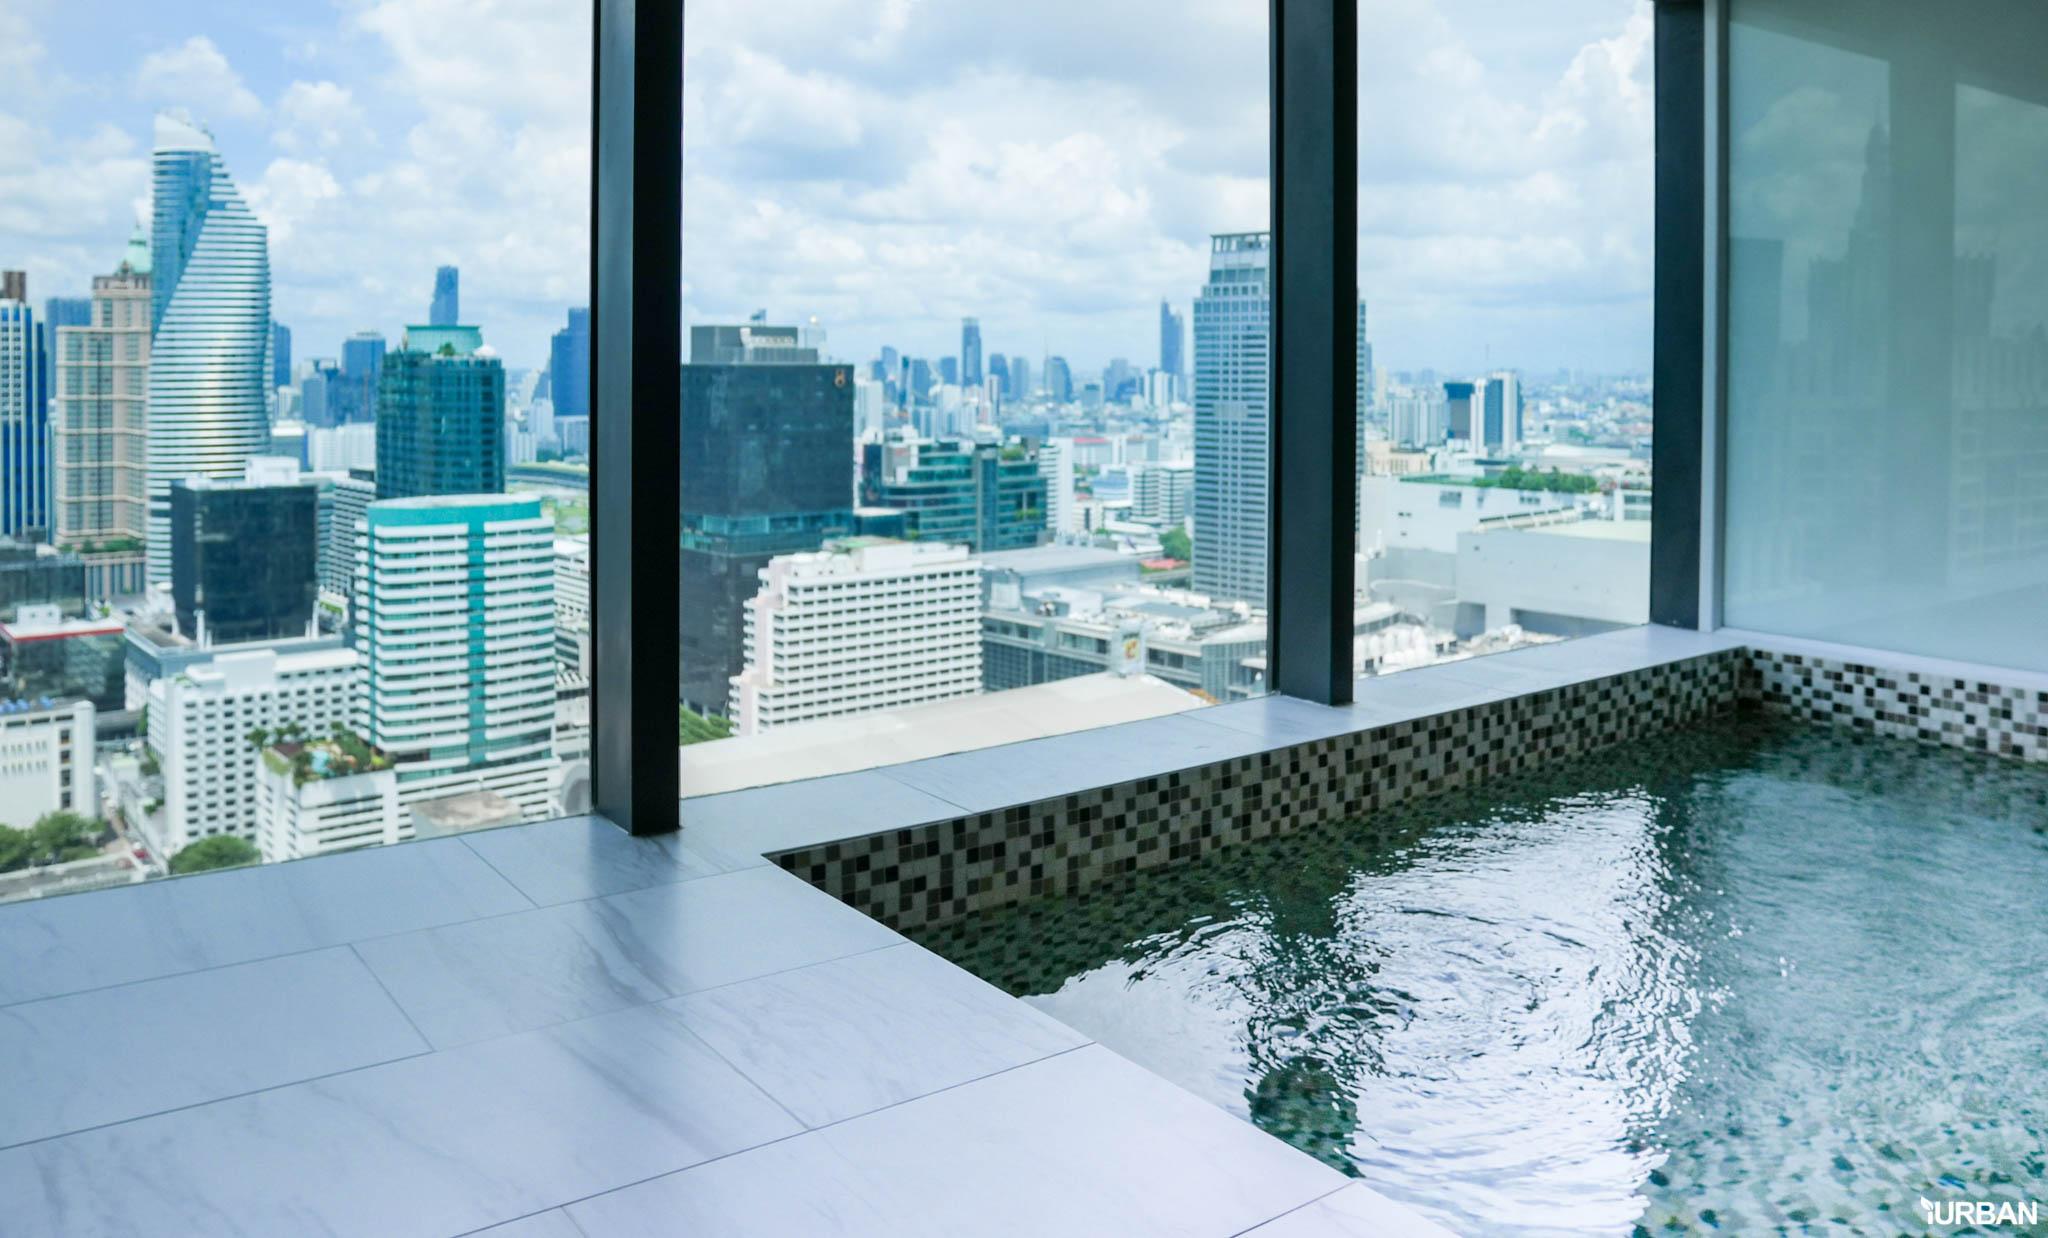 "12 Guide invite Farang เที่ยวราชประสงค์-ชิดลมจนต้องร้องว่า ""ไอเลิฟเมืองไทย ไอไลค์ชิดลม!"" 63 - Bangkok"